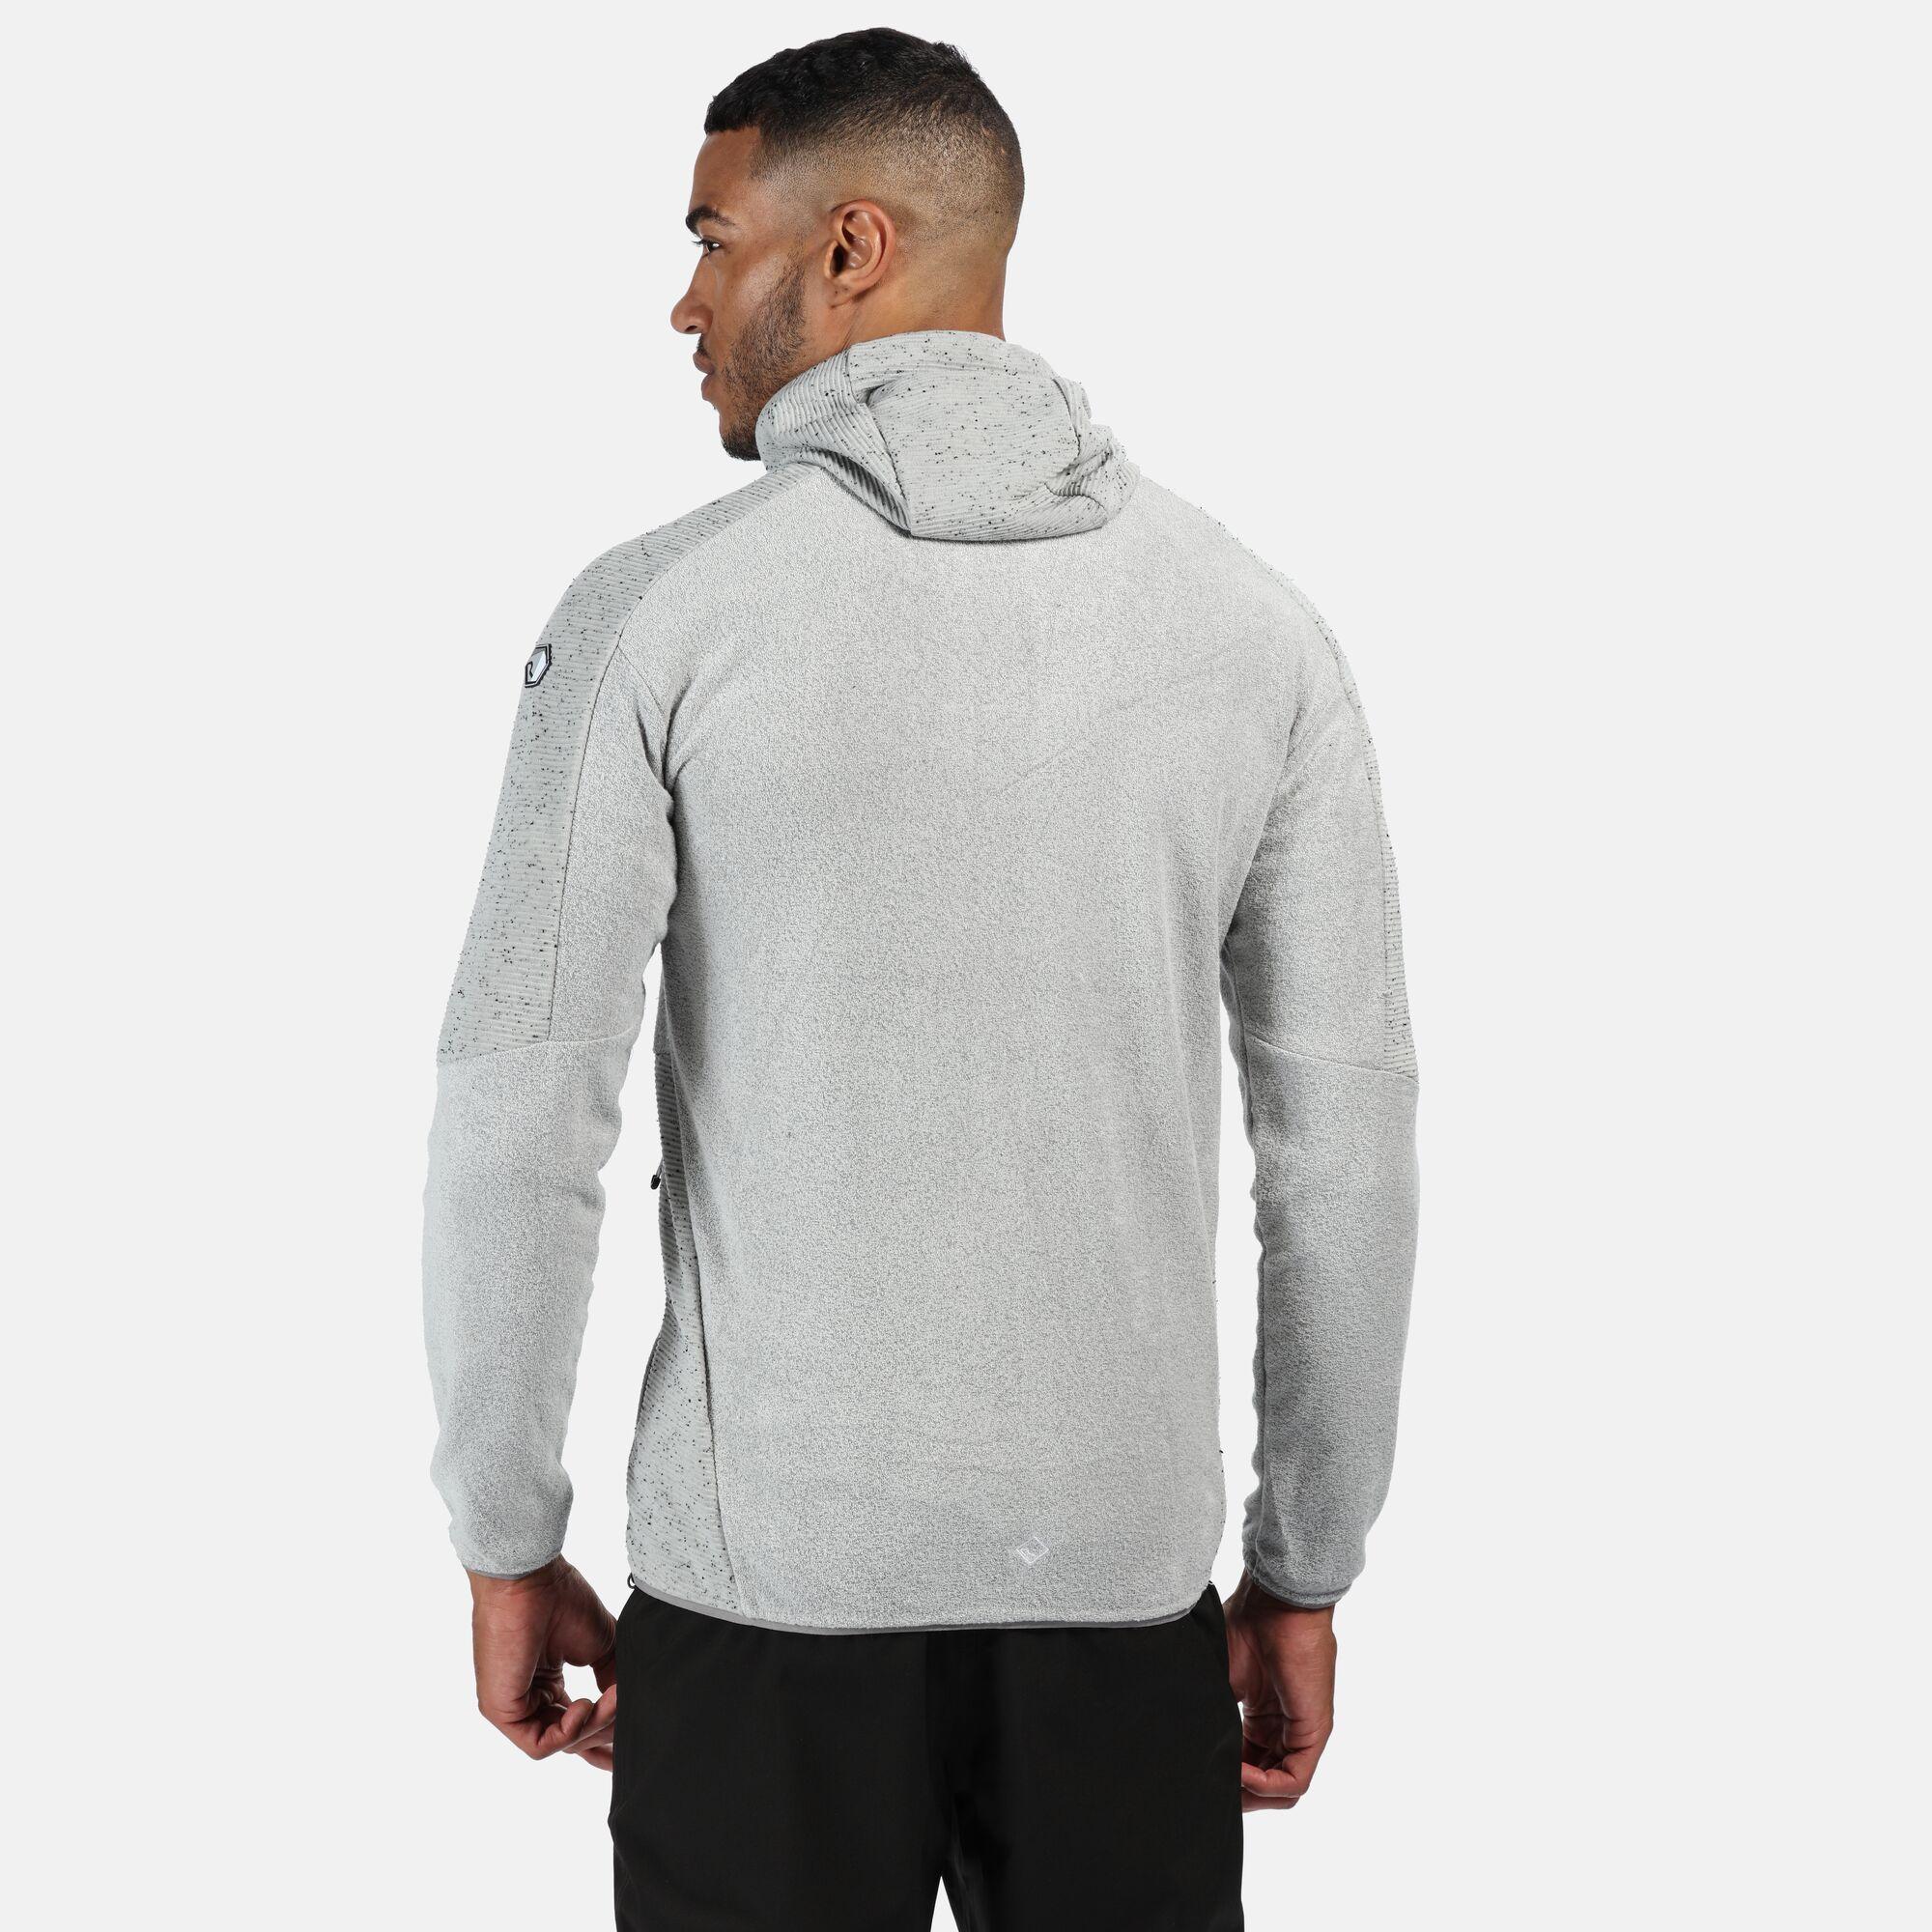 Regatta Men/'s Madagascar Full Zip Heavyweight Hooded Fleece Grey